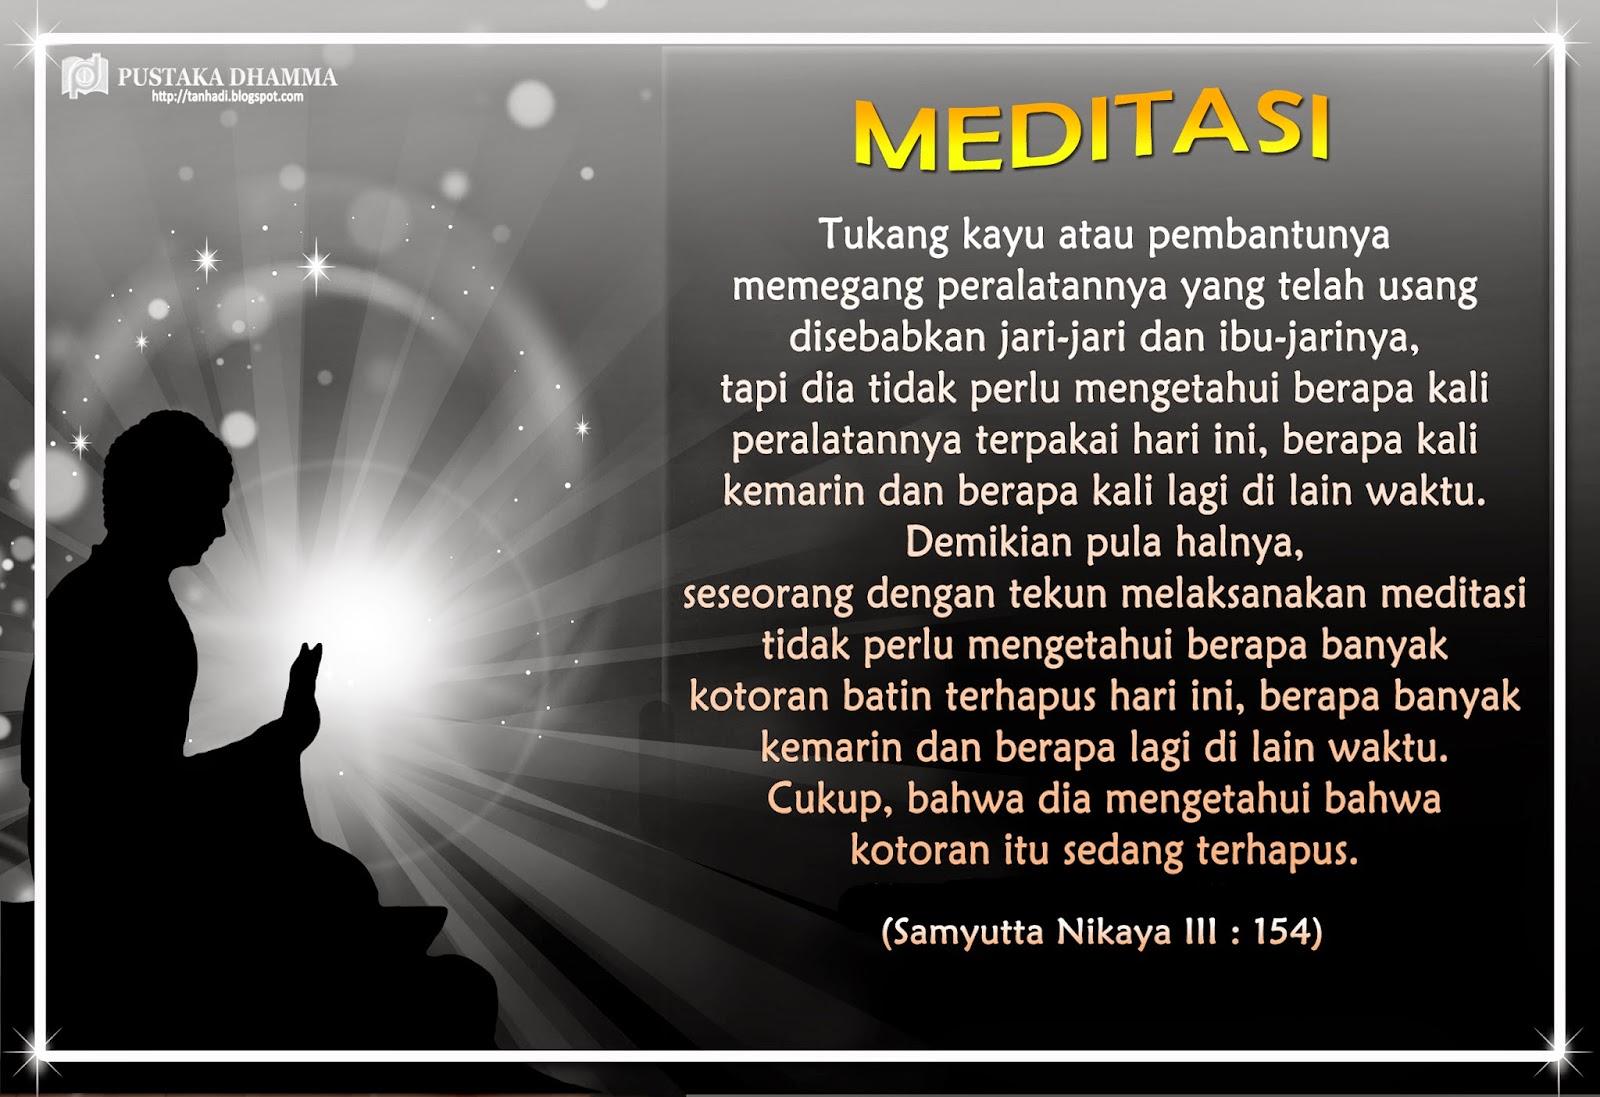 PUSTAKA DHAMMA Sabda Sang Buddha 110 Meditasi